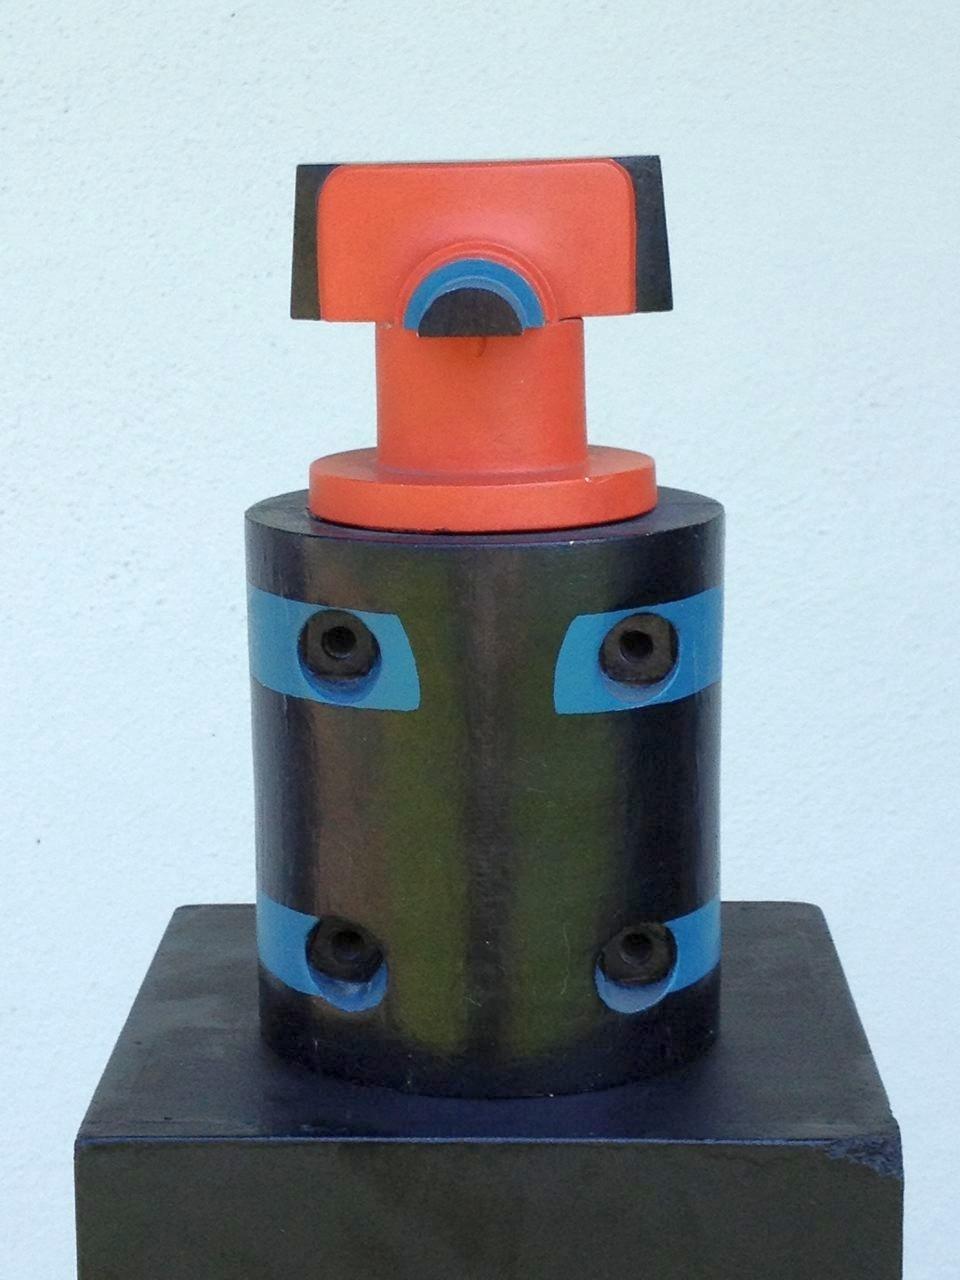 Technik-Idol 2, Holzobjekt farbig bemalt, 26 x 12 x 12 cm, 1971 (#564)